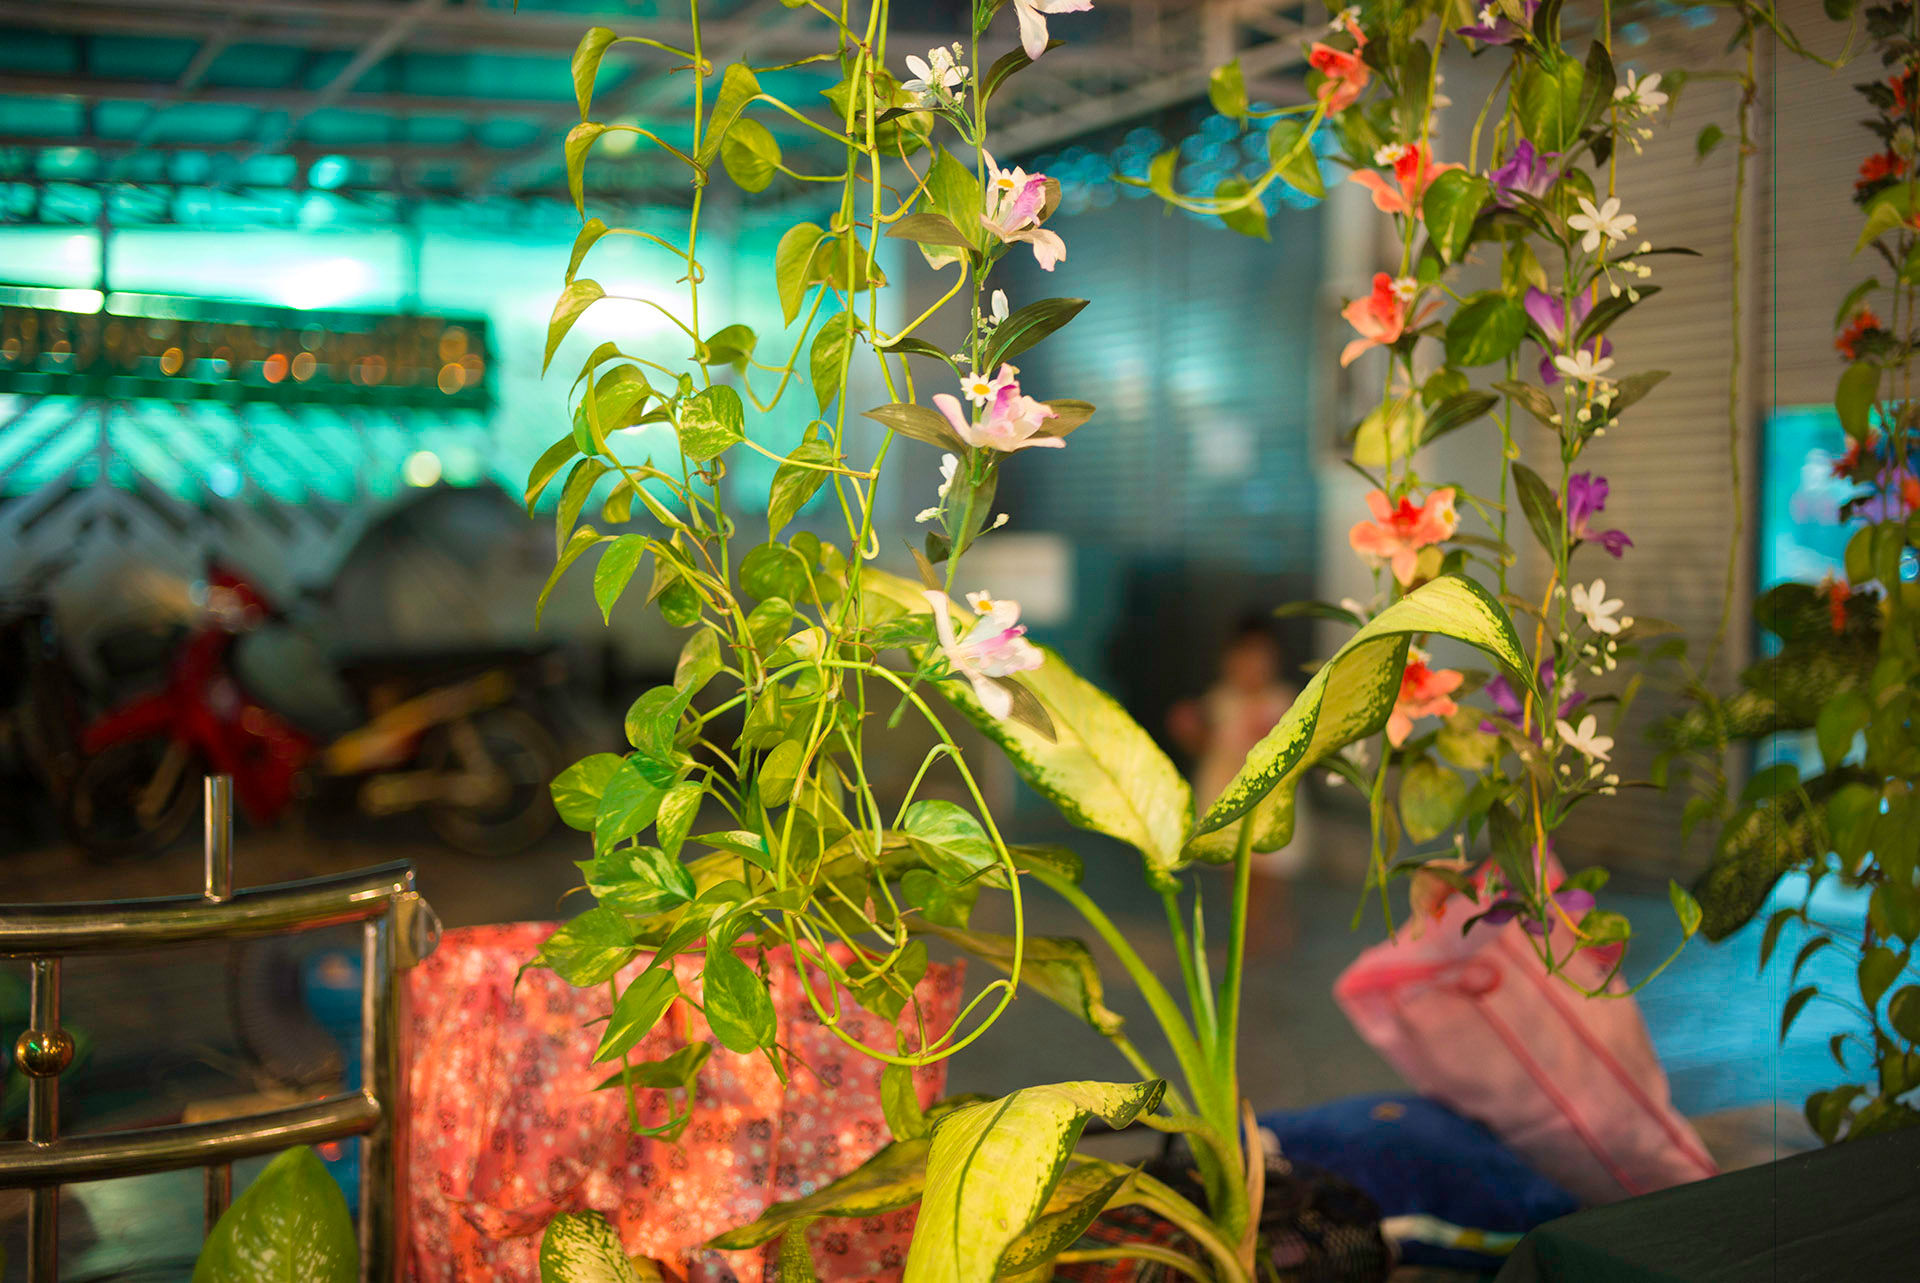 Restaurant Flowers, Chiang Mai